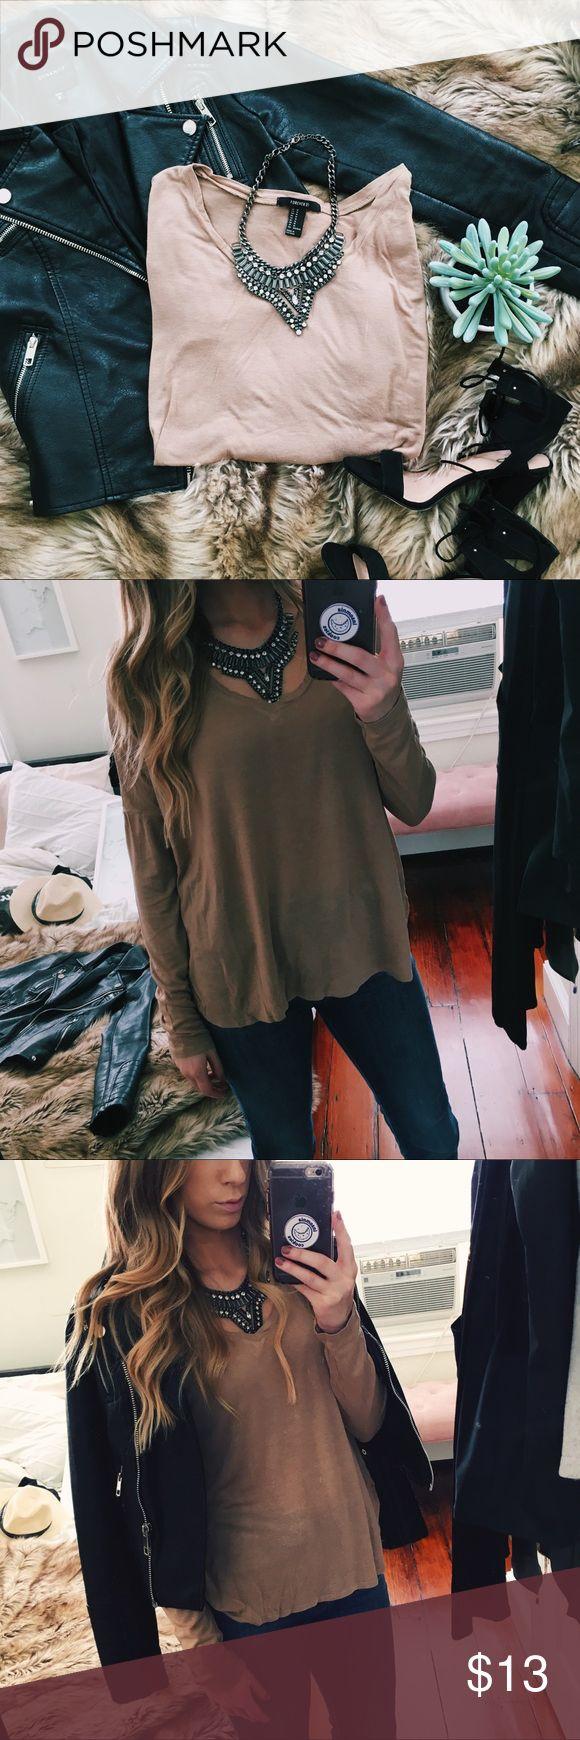 Camel colored long sleeve v neck t shirt A long sleeve camel colored t shirt. Size medium. Dropped shoulder. V neck. Excellent pre-loved condition. Forever 21 Tops Tees - Long Sleeve